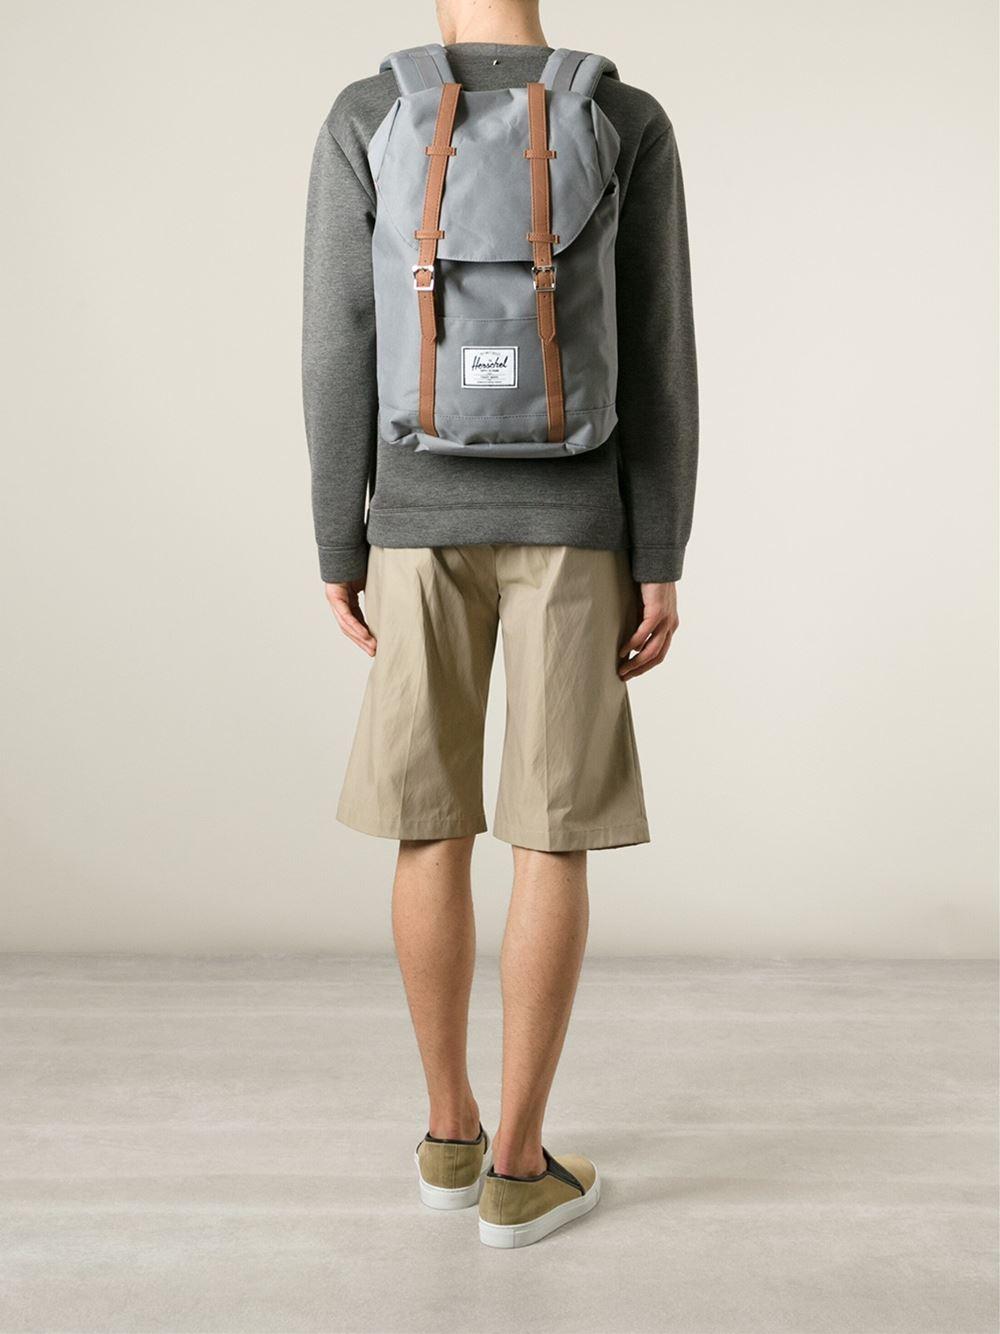 Lyst - Herschel Supply Co.  Retreat  Backpack in Gray for Men 6e58e2b8358d3